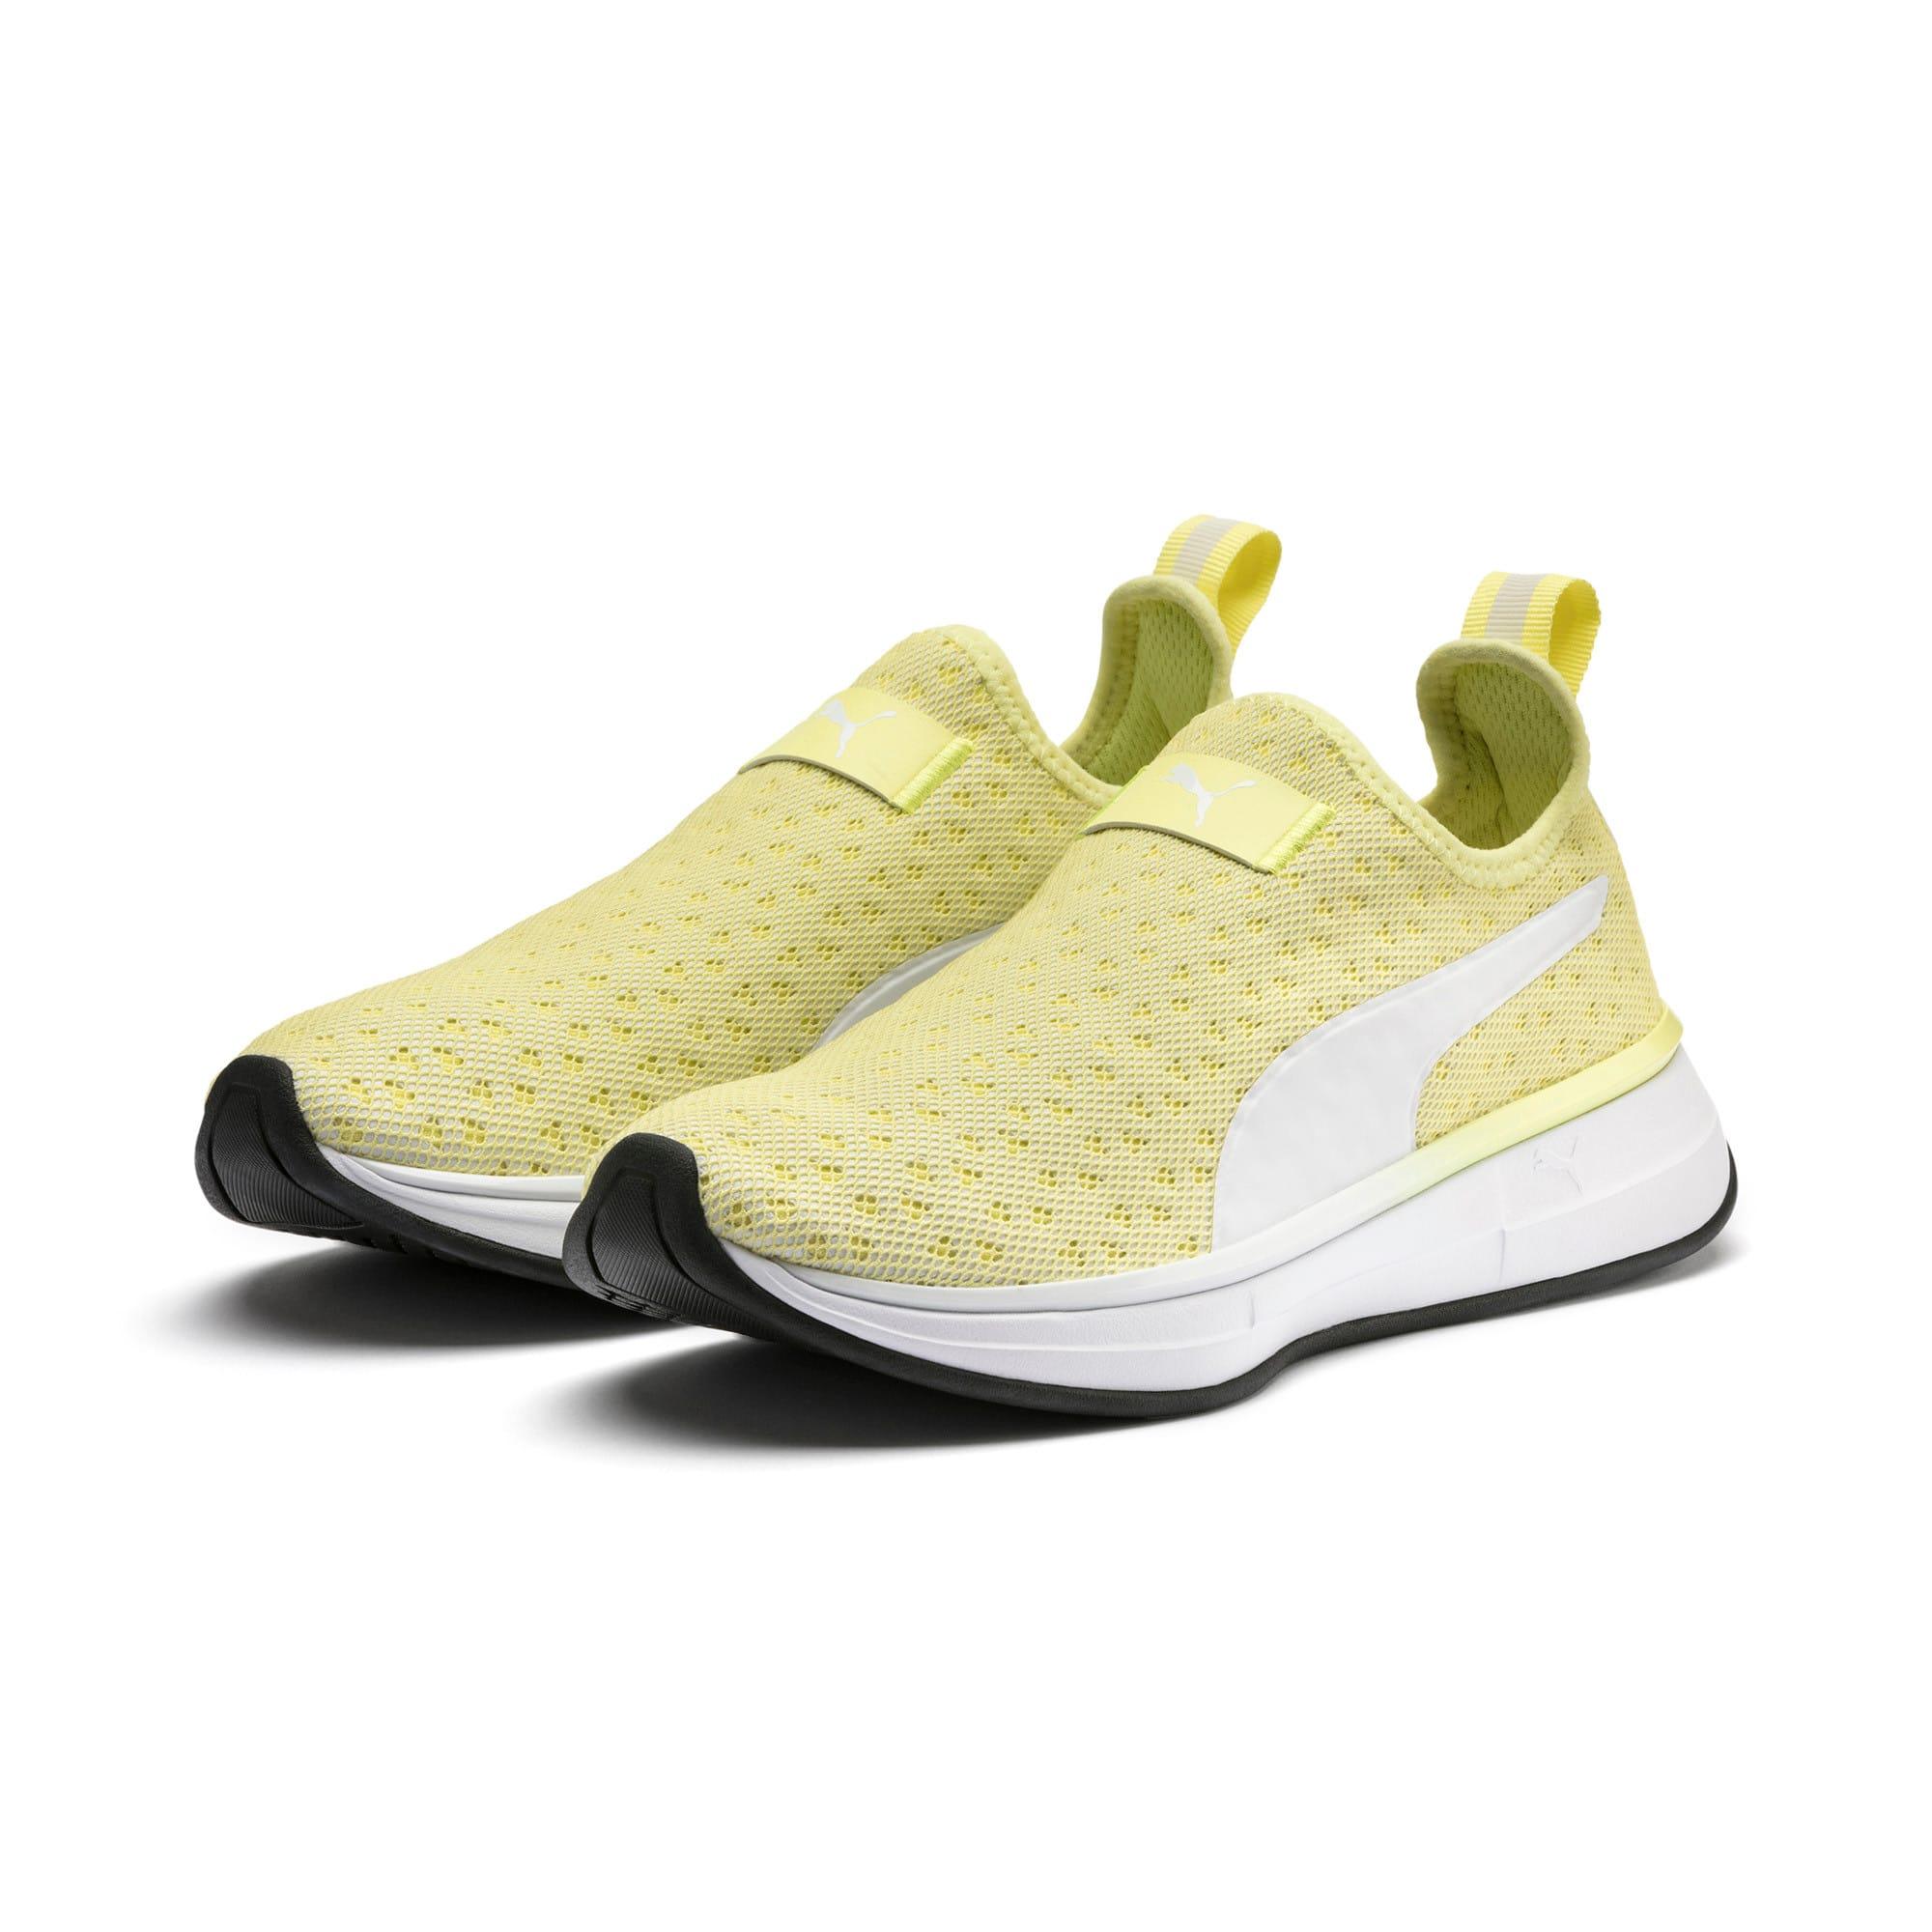 Thumbnail 3 of SG Slip-on Bright Women's Training Shoes, YELLOW-Puma White-Puma Black, medium